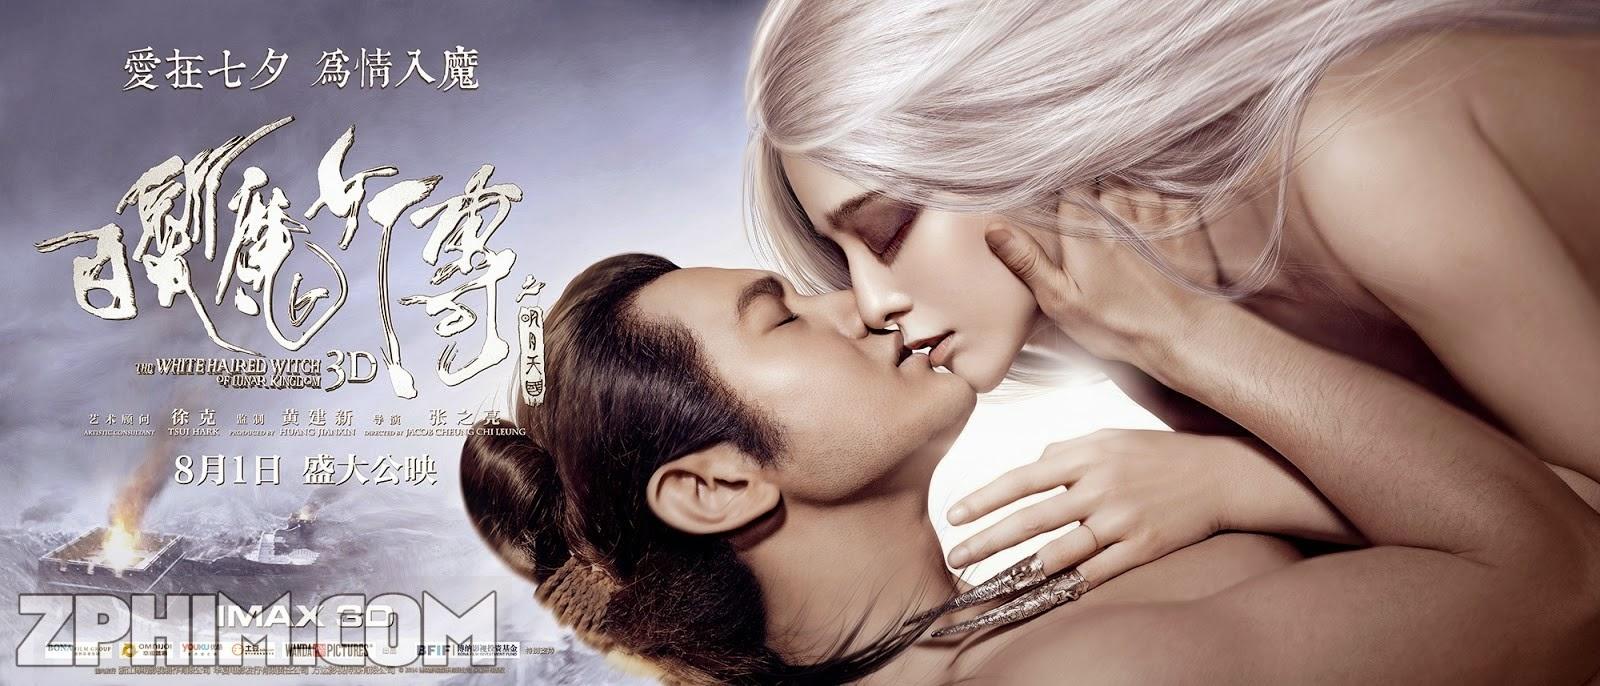 Ảnh trong phim Tân Bạch Phát Ma Nữ - The White Haired Witch of Lunar Kingdom 1